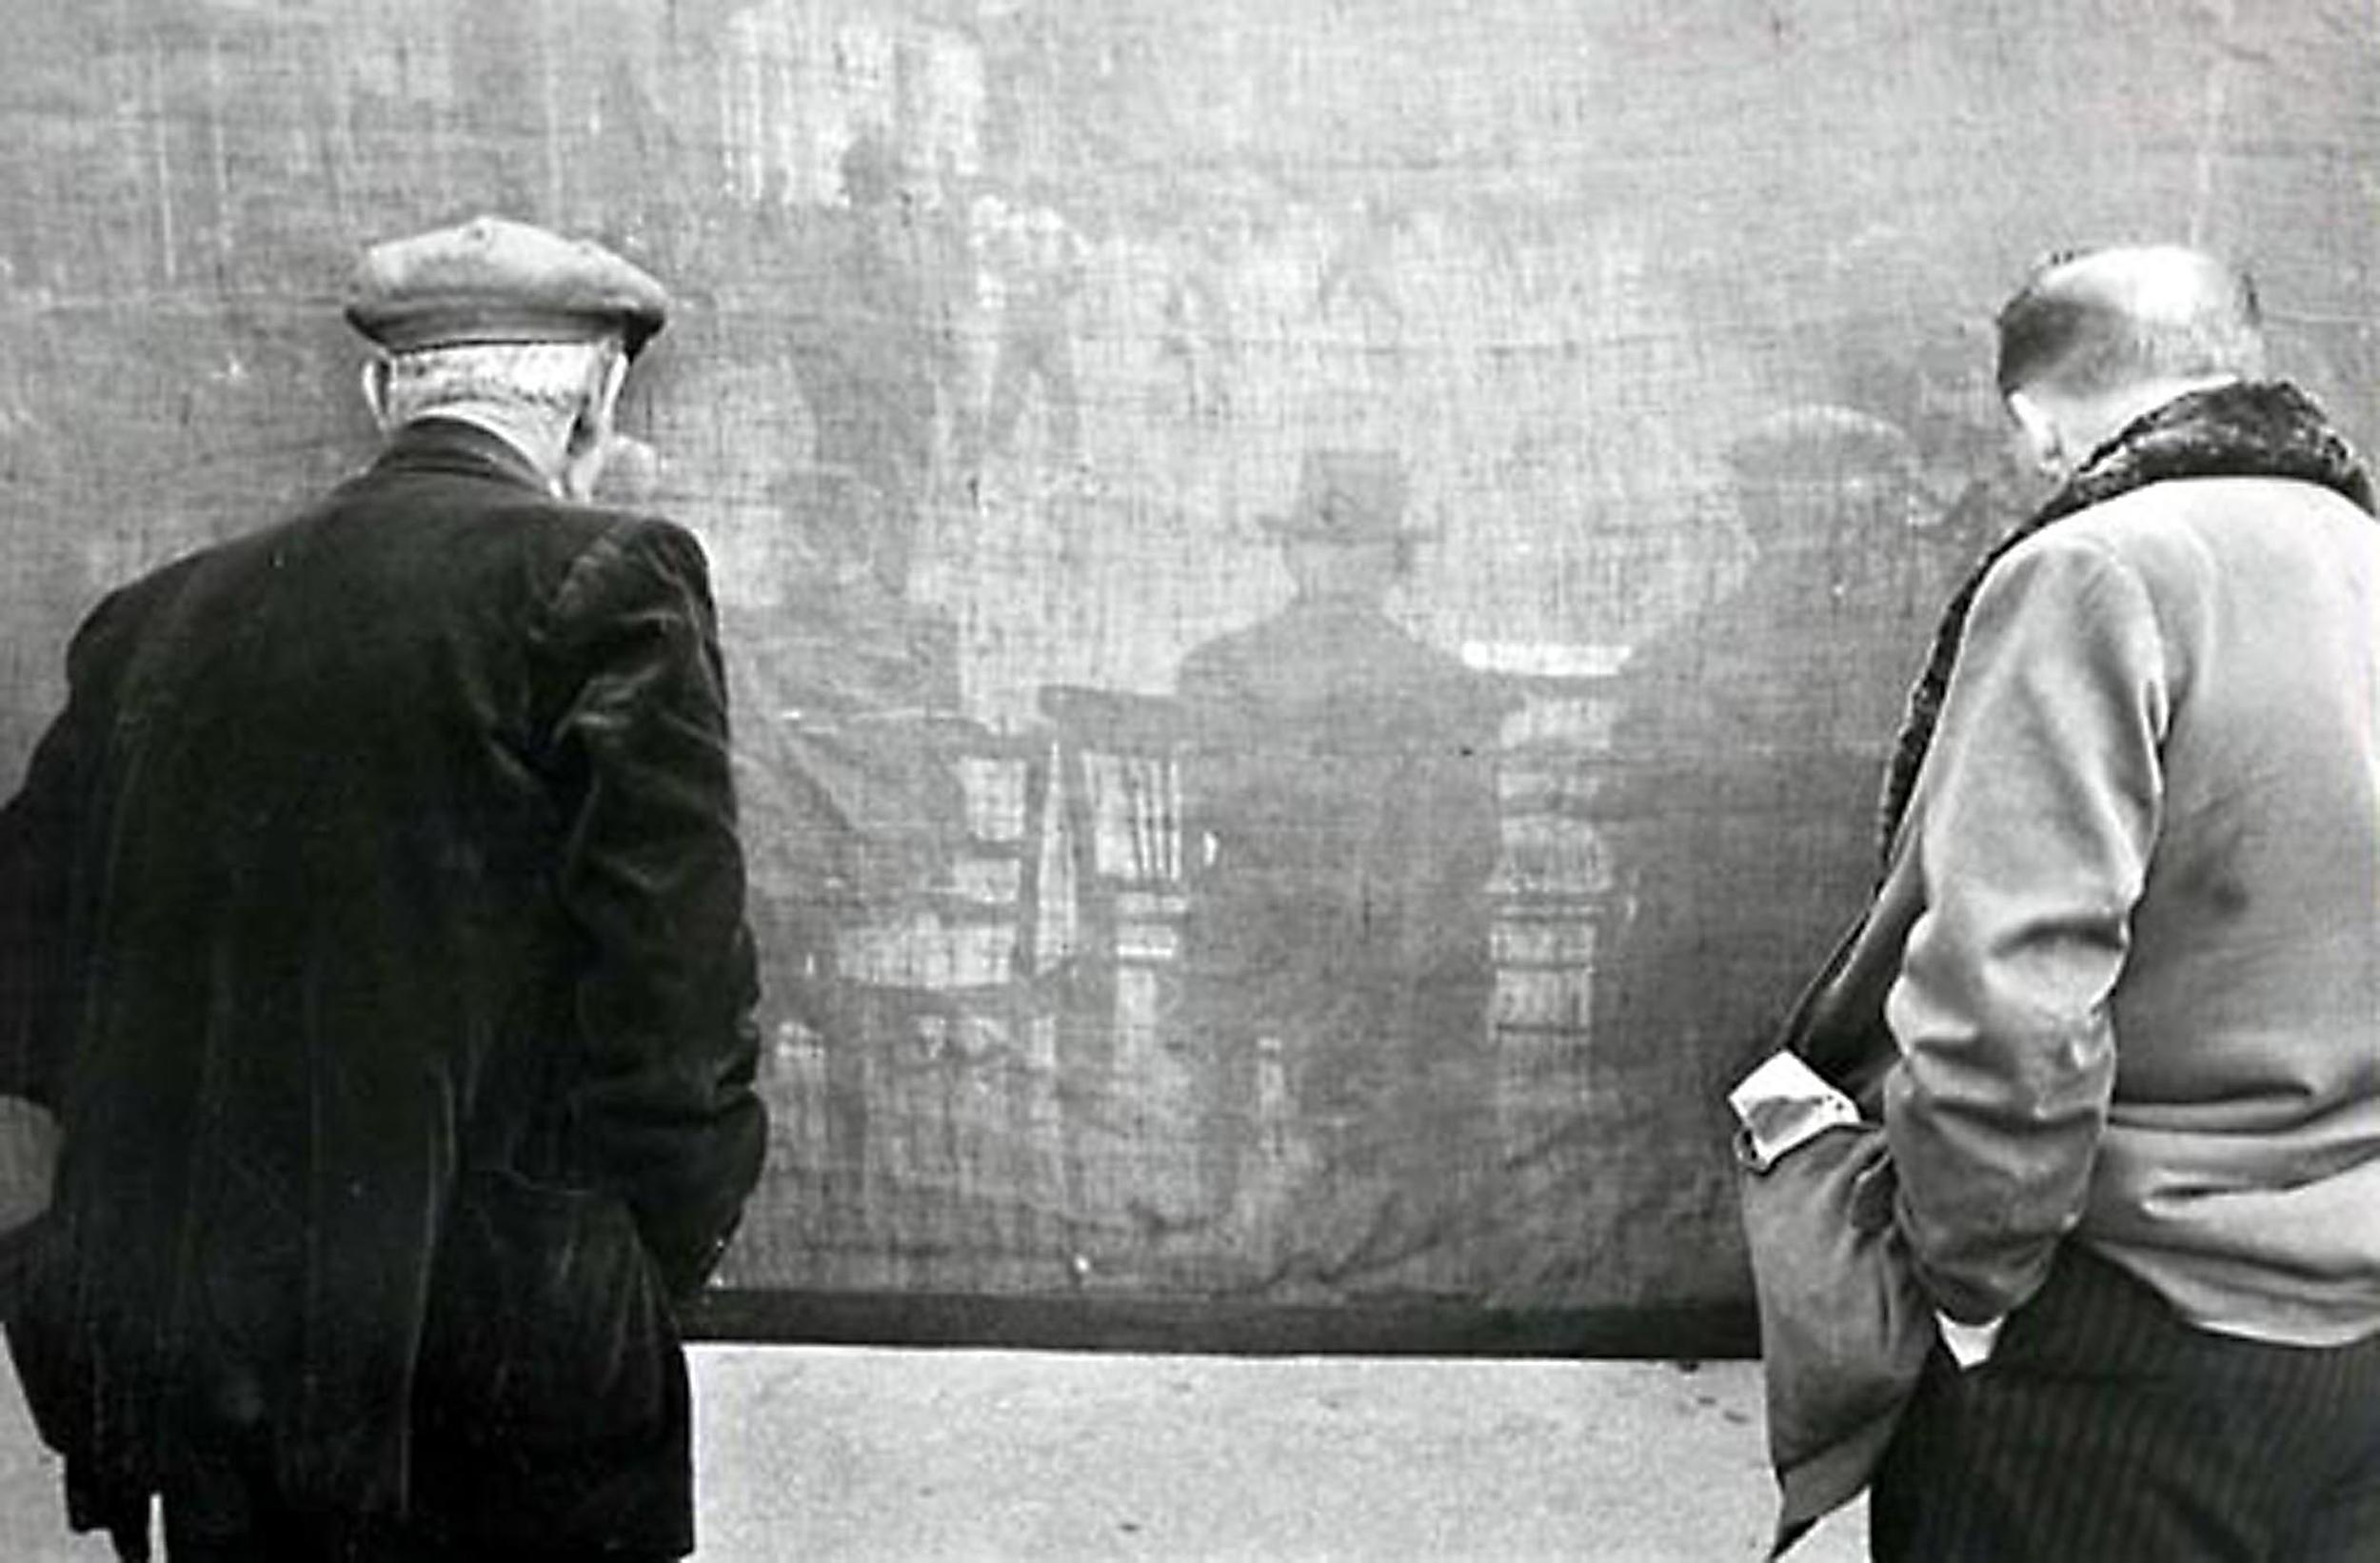 HANNON_spectators_brussels_(belgium)_1957_11x14_high.jpg